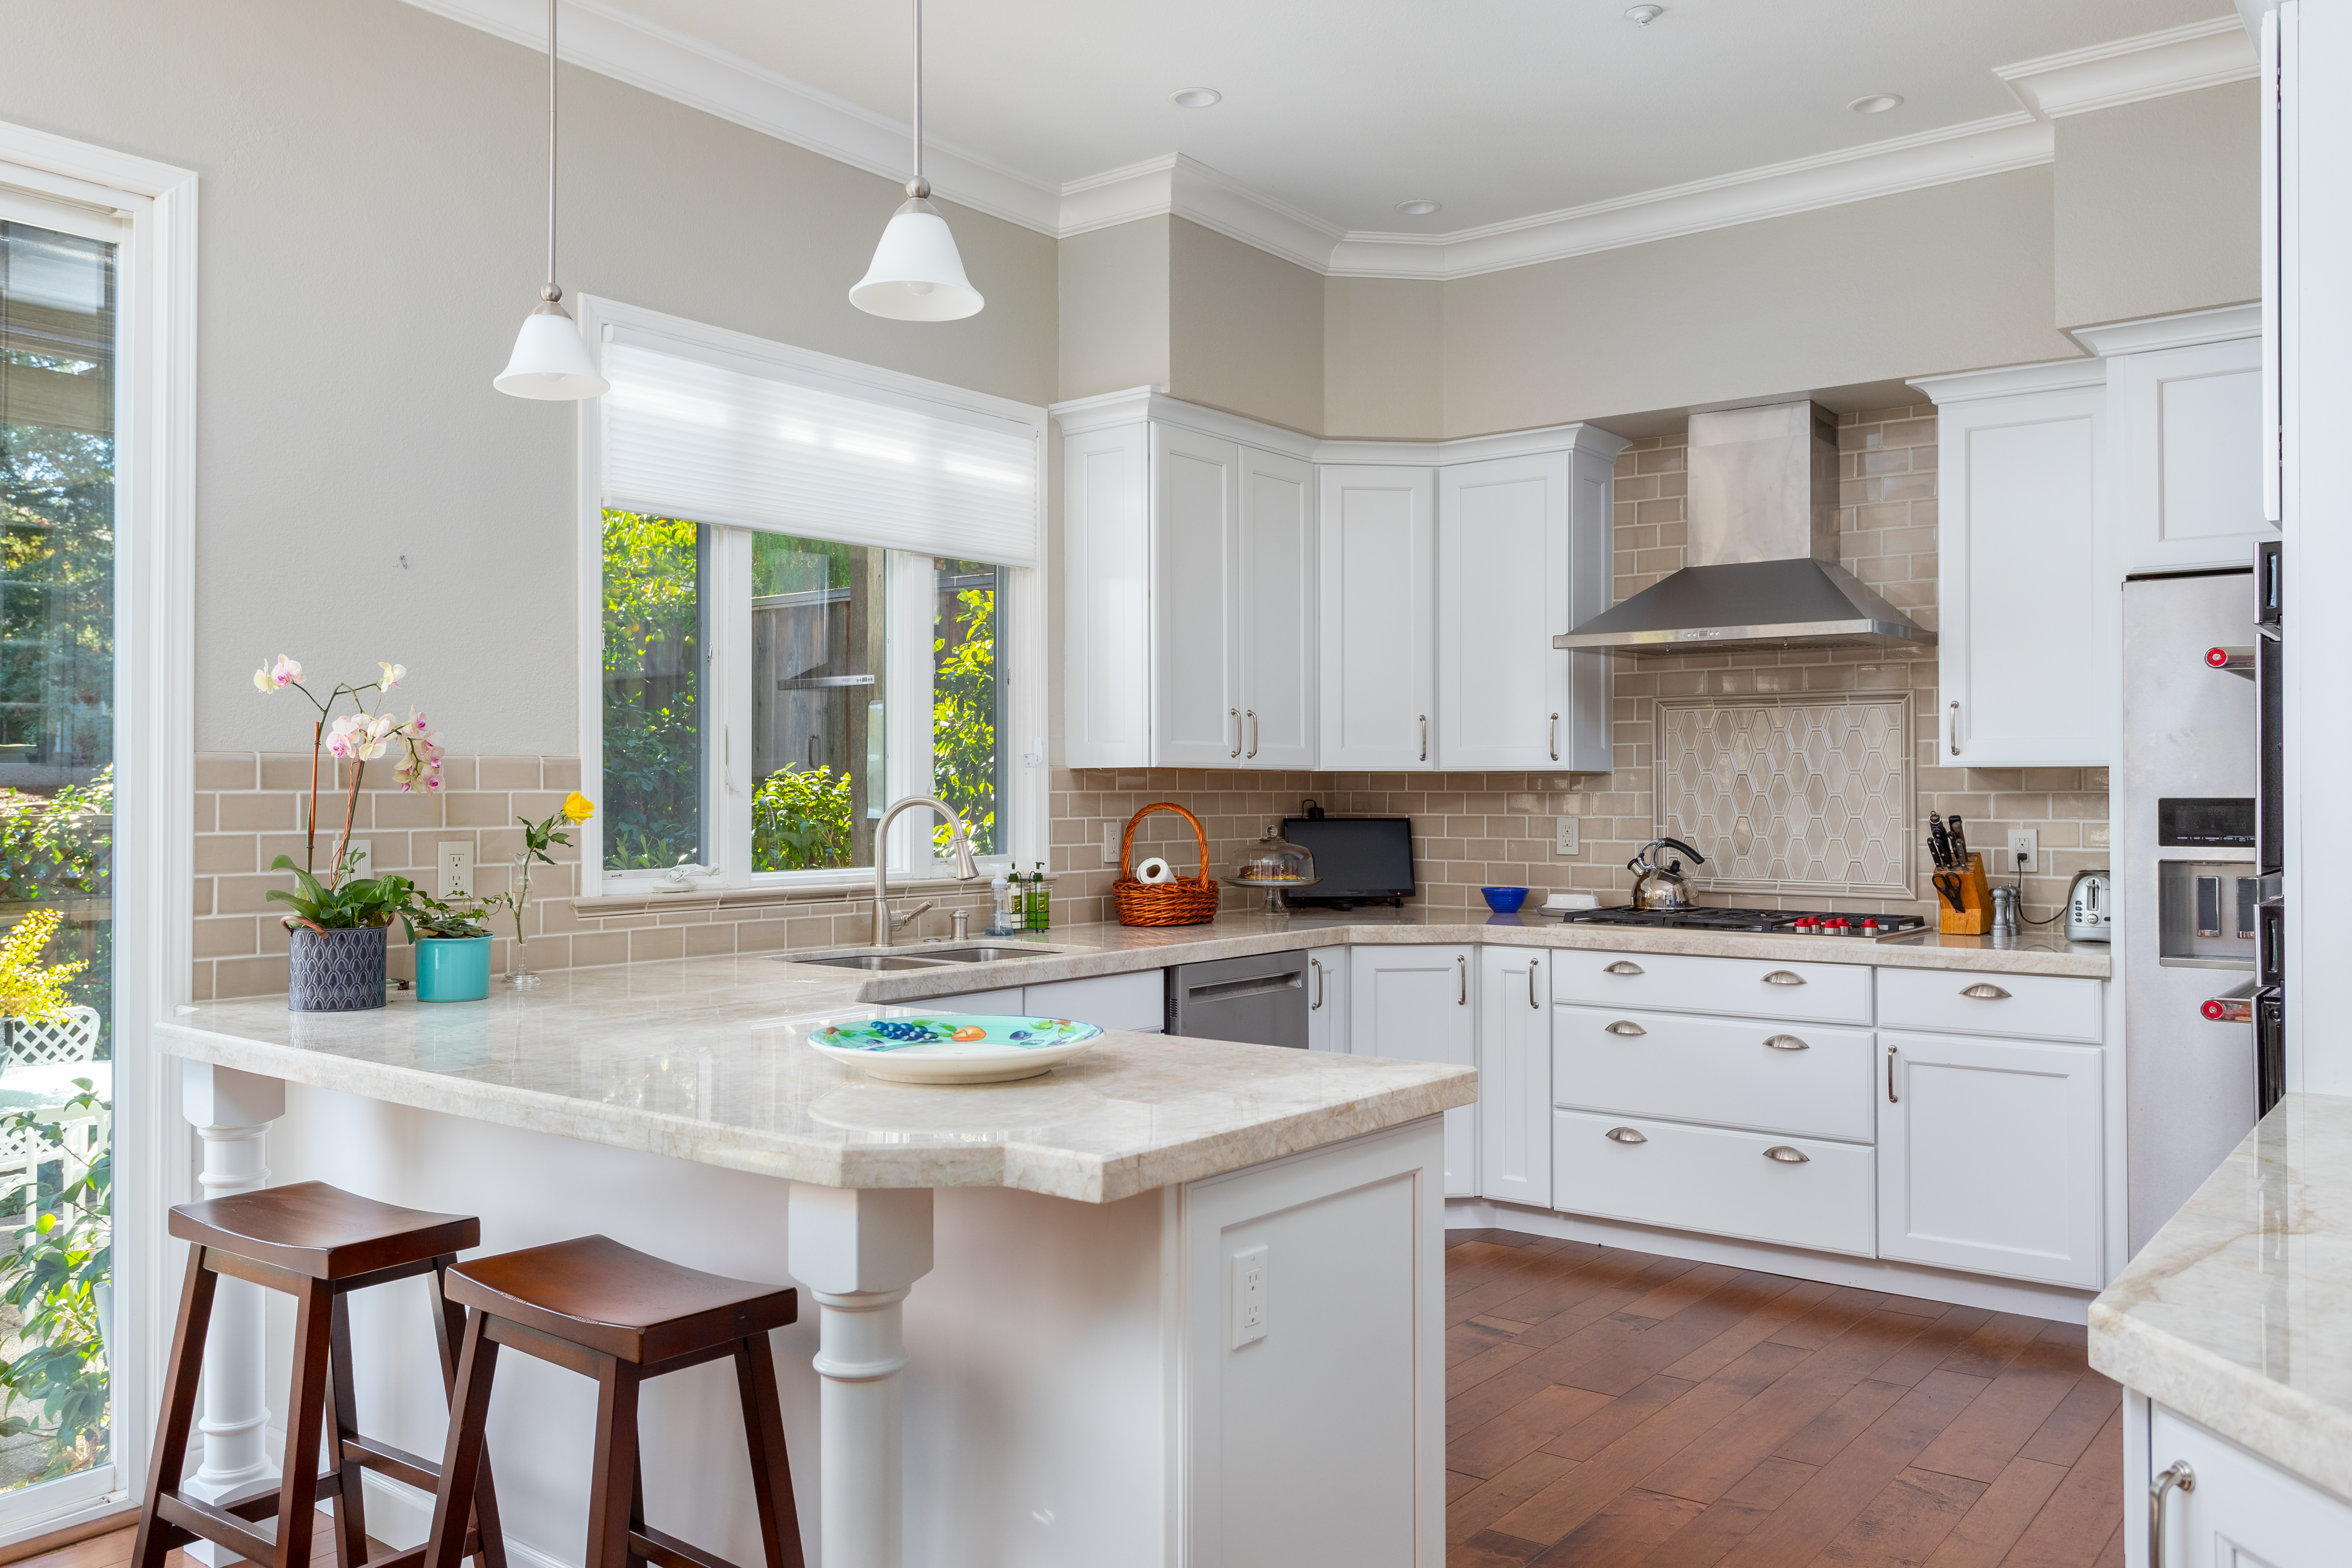 65 Kitchens With Peninsulas Photos